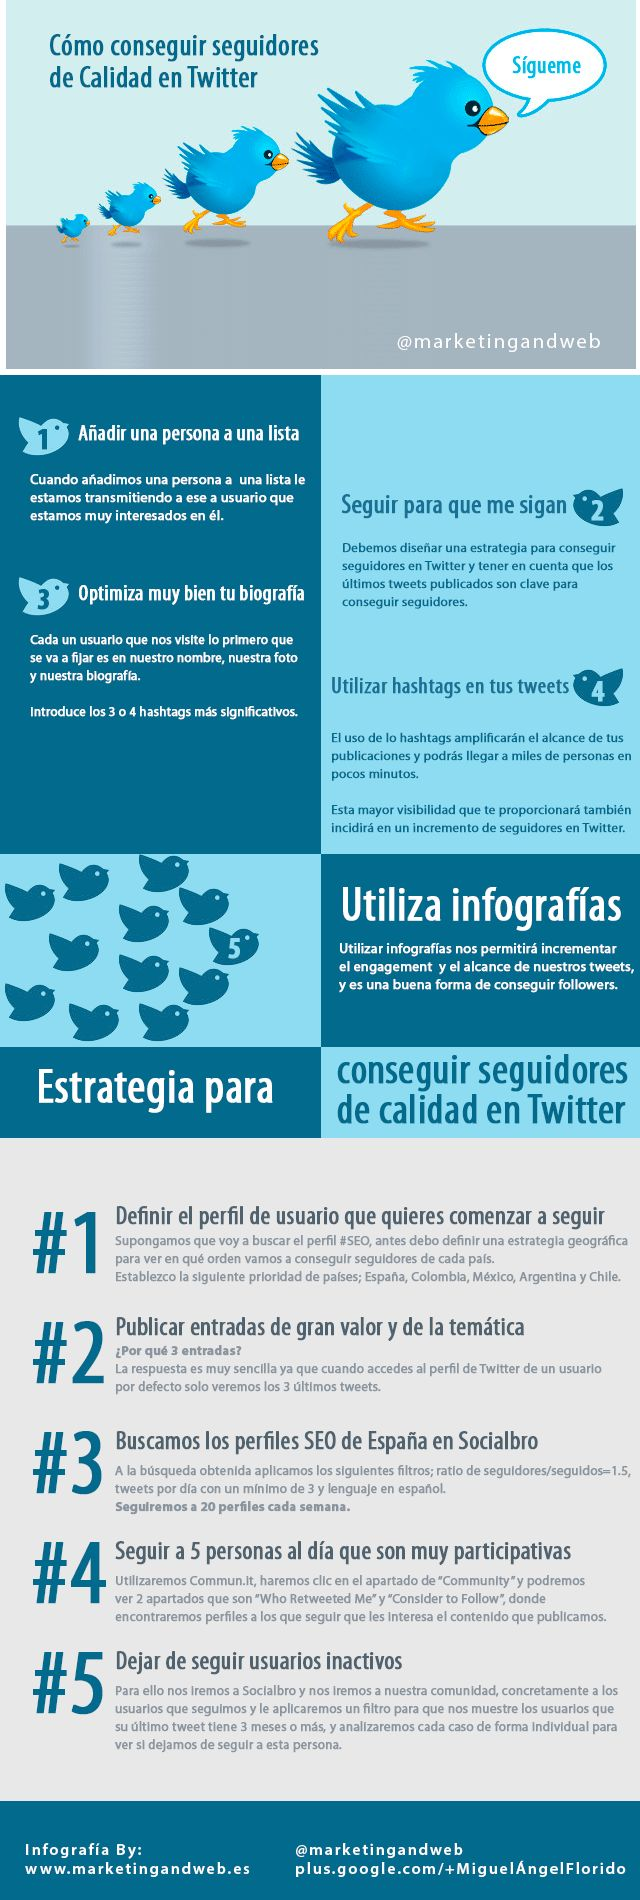 cómo conseguir seguidores de calidad en twitter  #twitter #followers #socialmedia #SM #Communitymanager